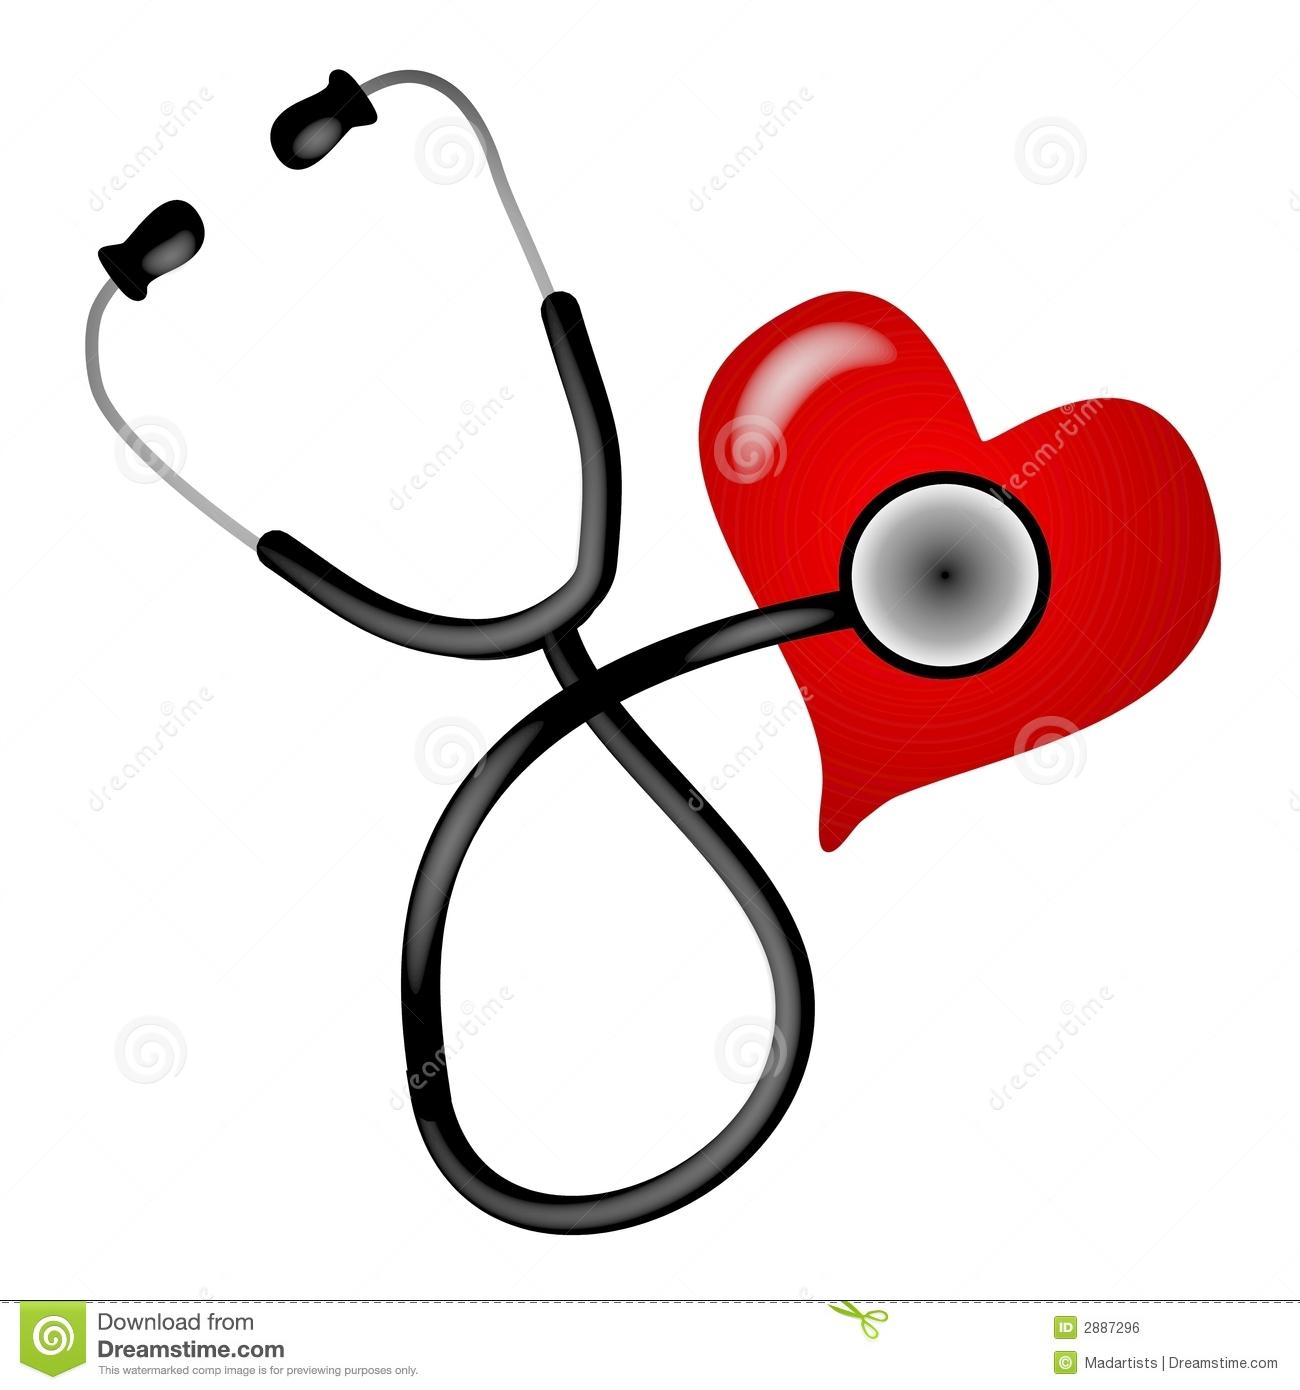 Illustration De Coeur De Stéthoscope Illustration Stock avec Dessin Stéthoscope